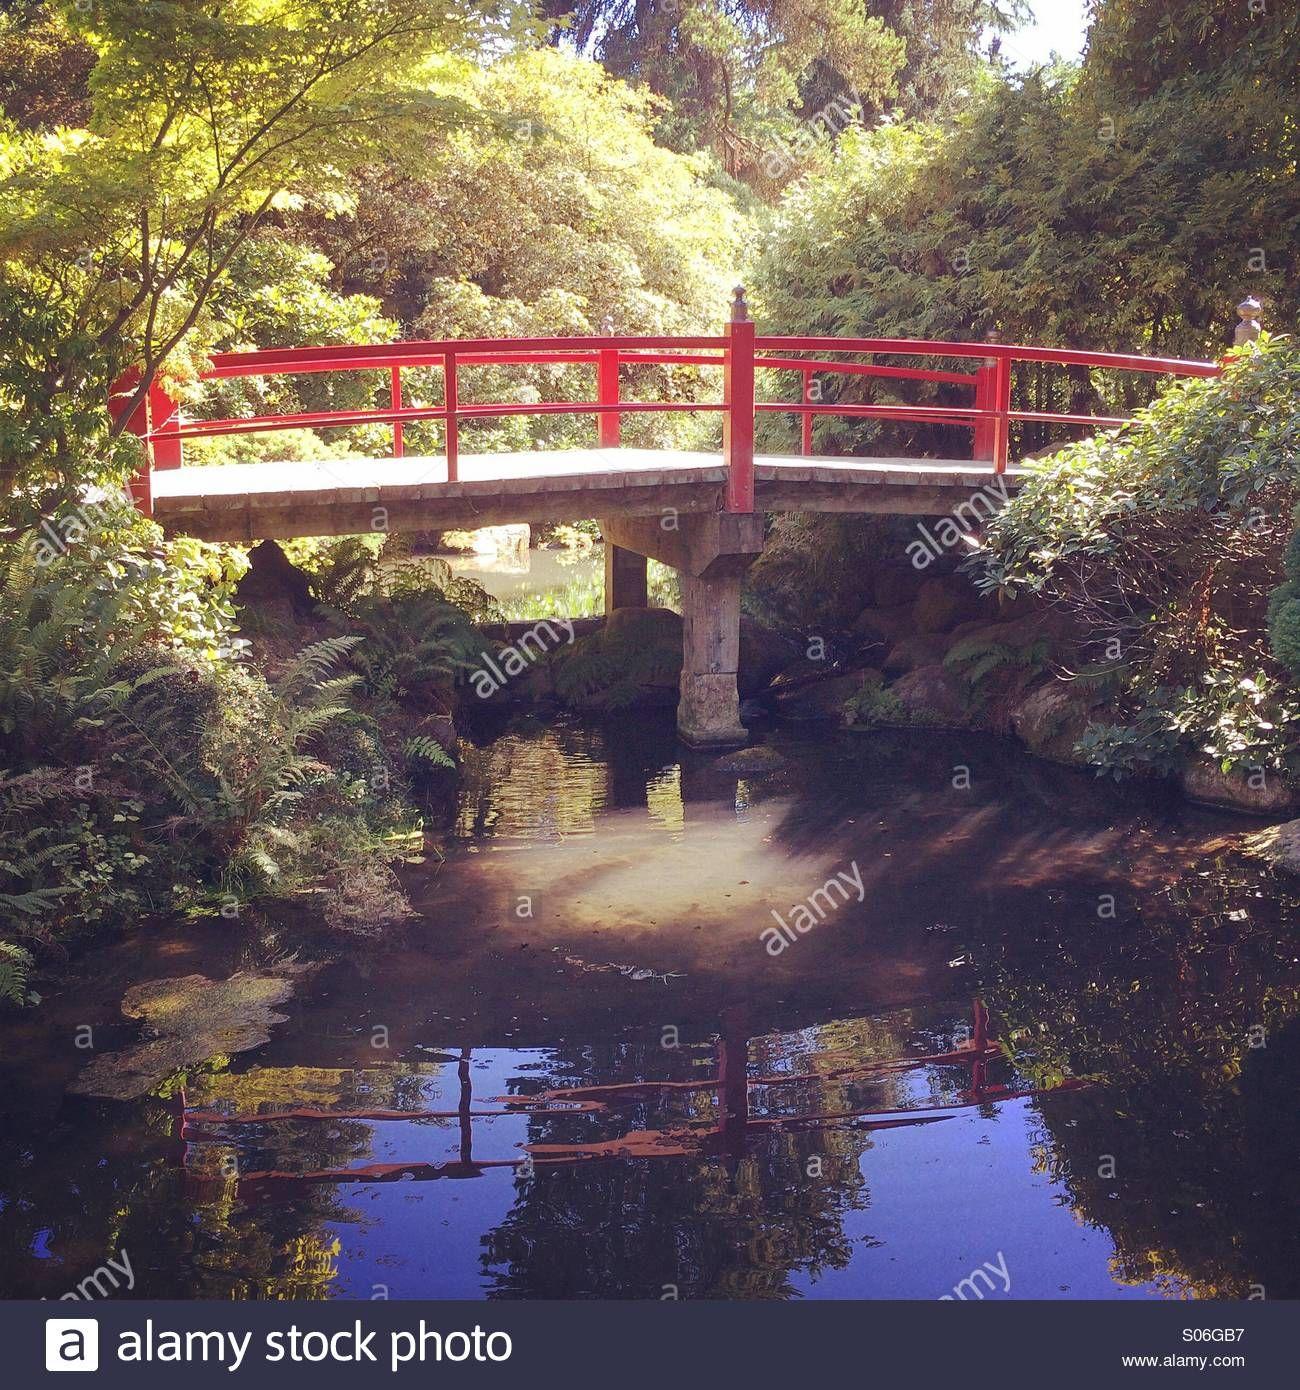 Download this stock image Traditional bridge,Japanese